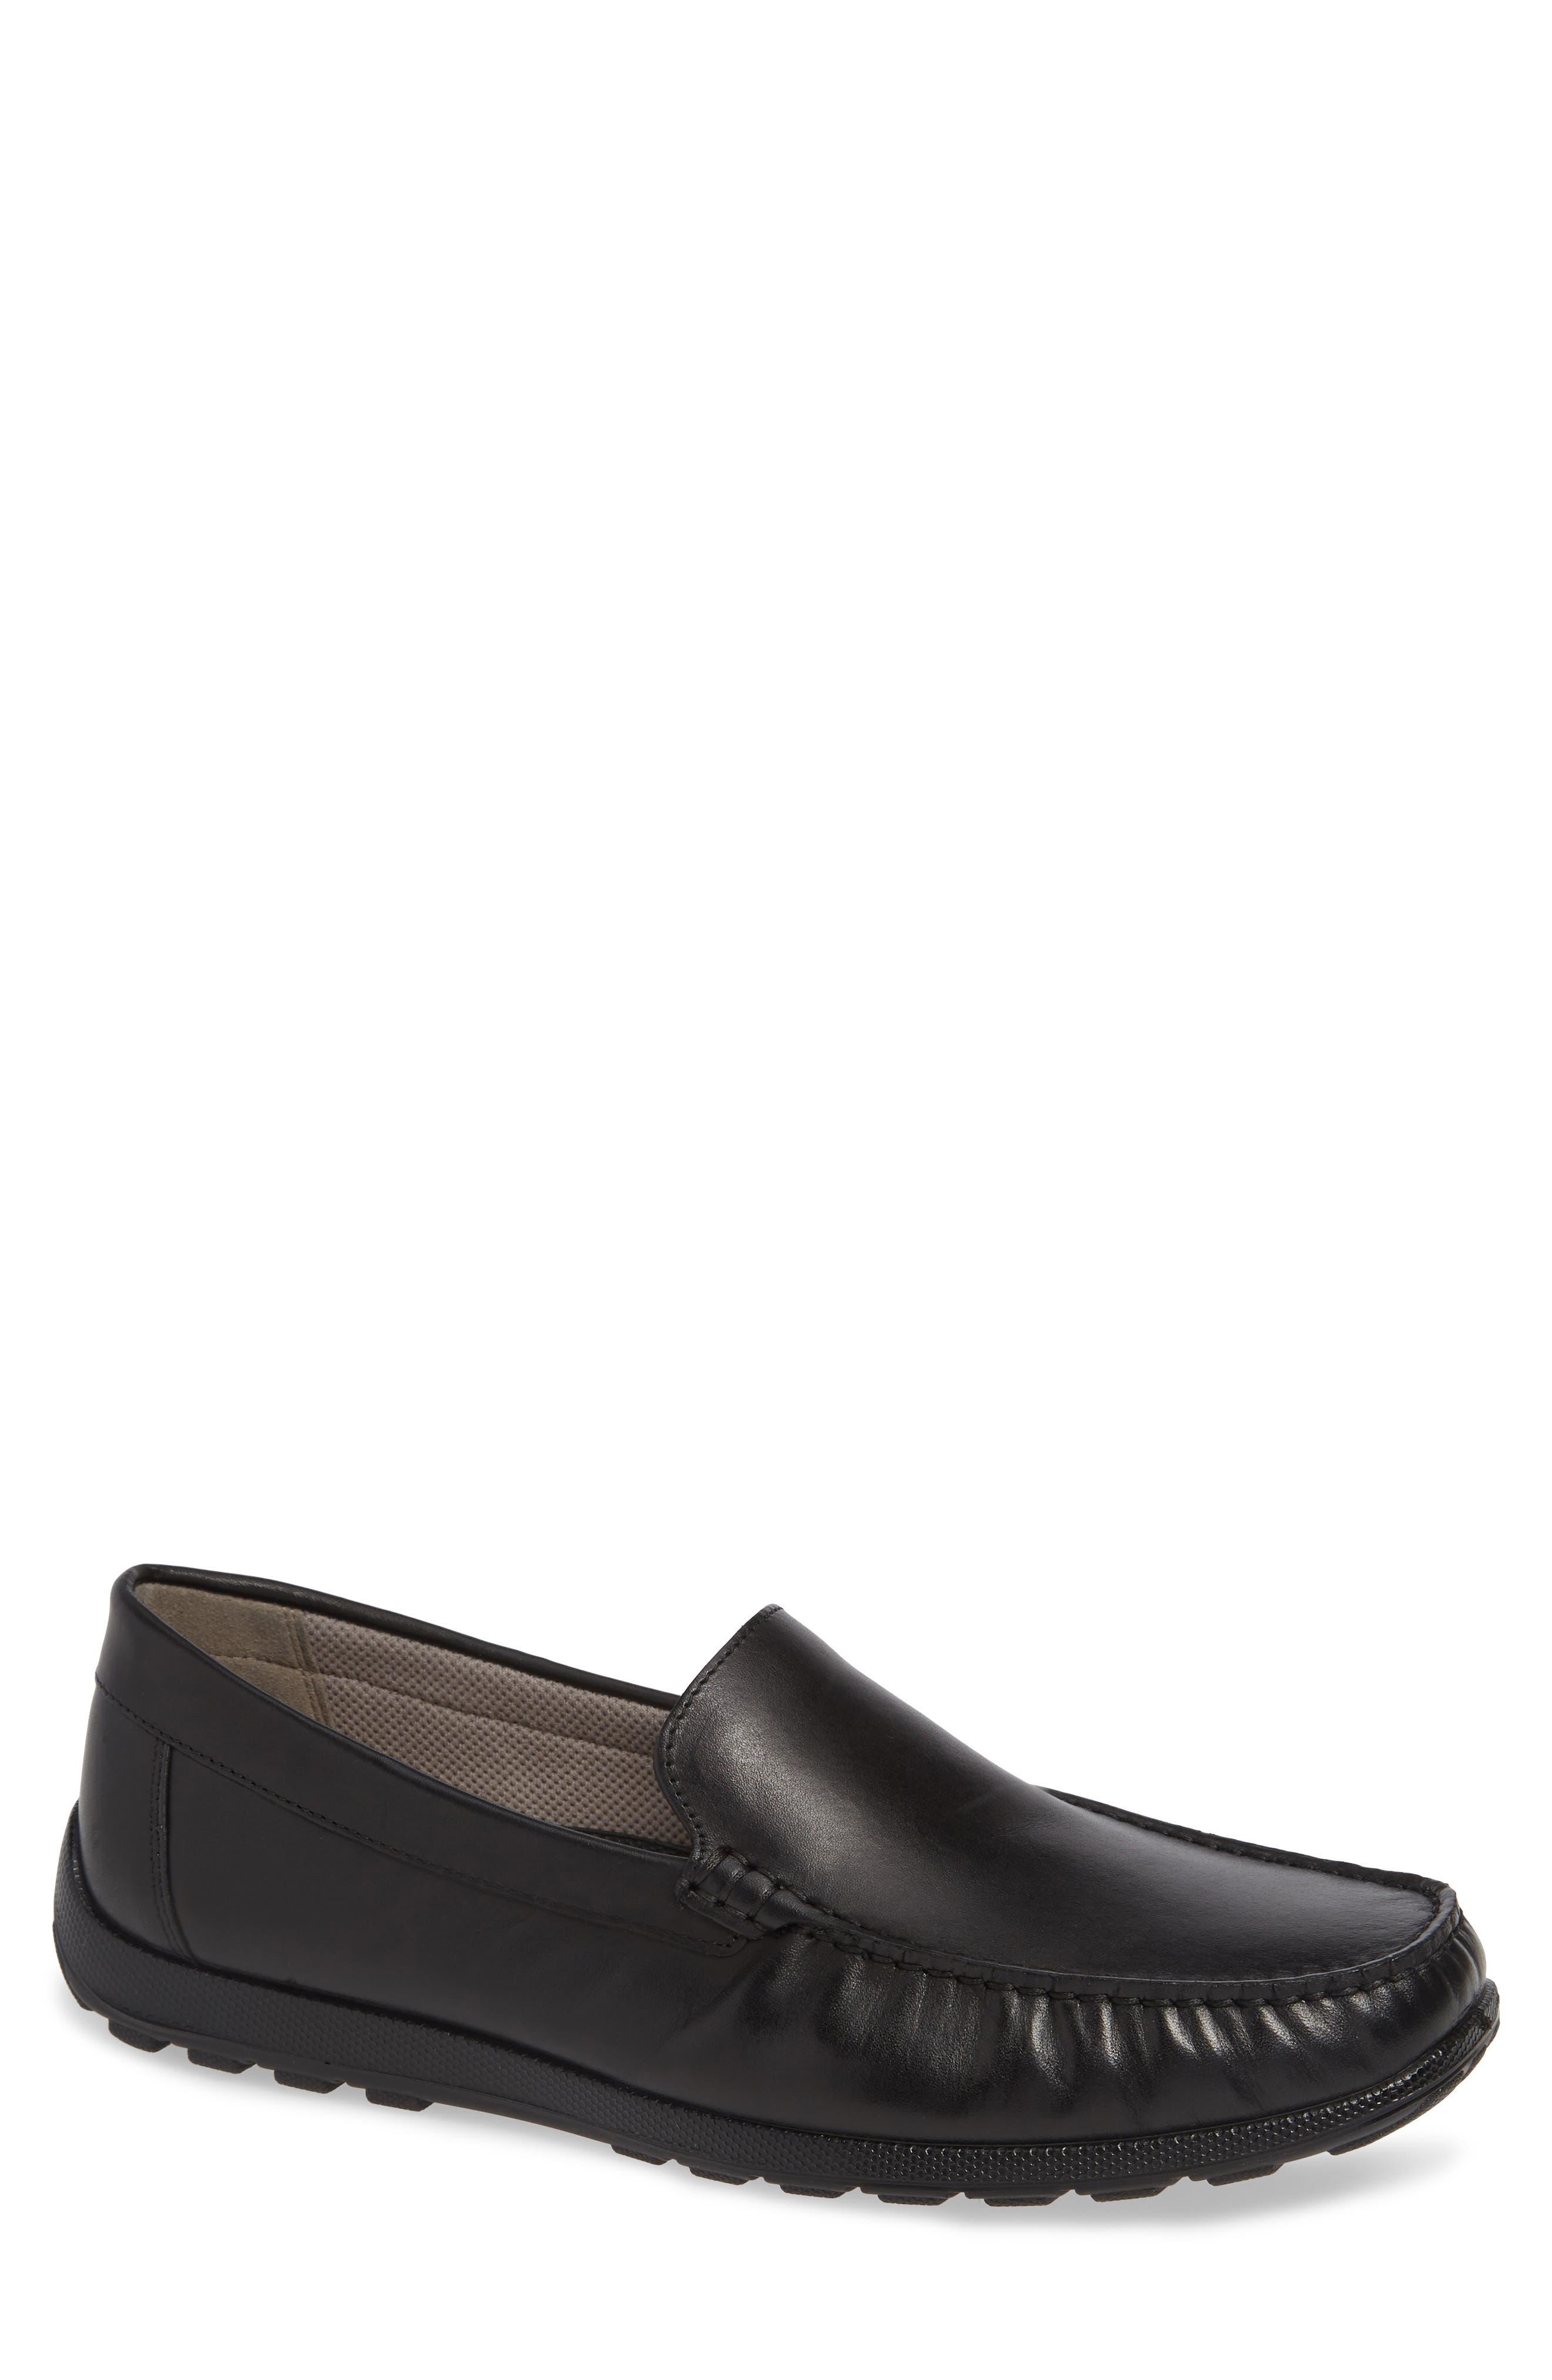 ECCO, Reciprico Driving Shoe, Main thumbnail 1, color, BLACK LEATHER